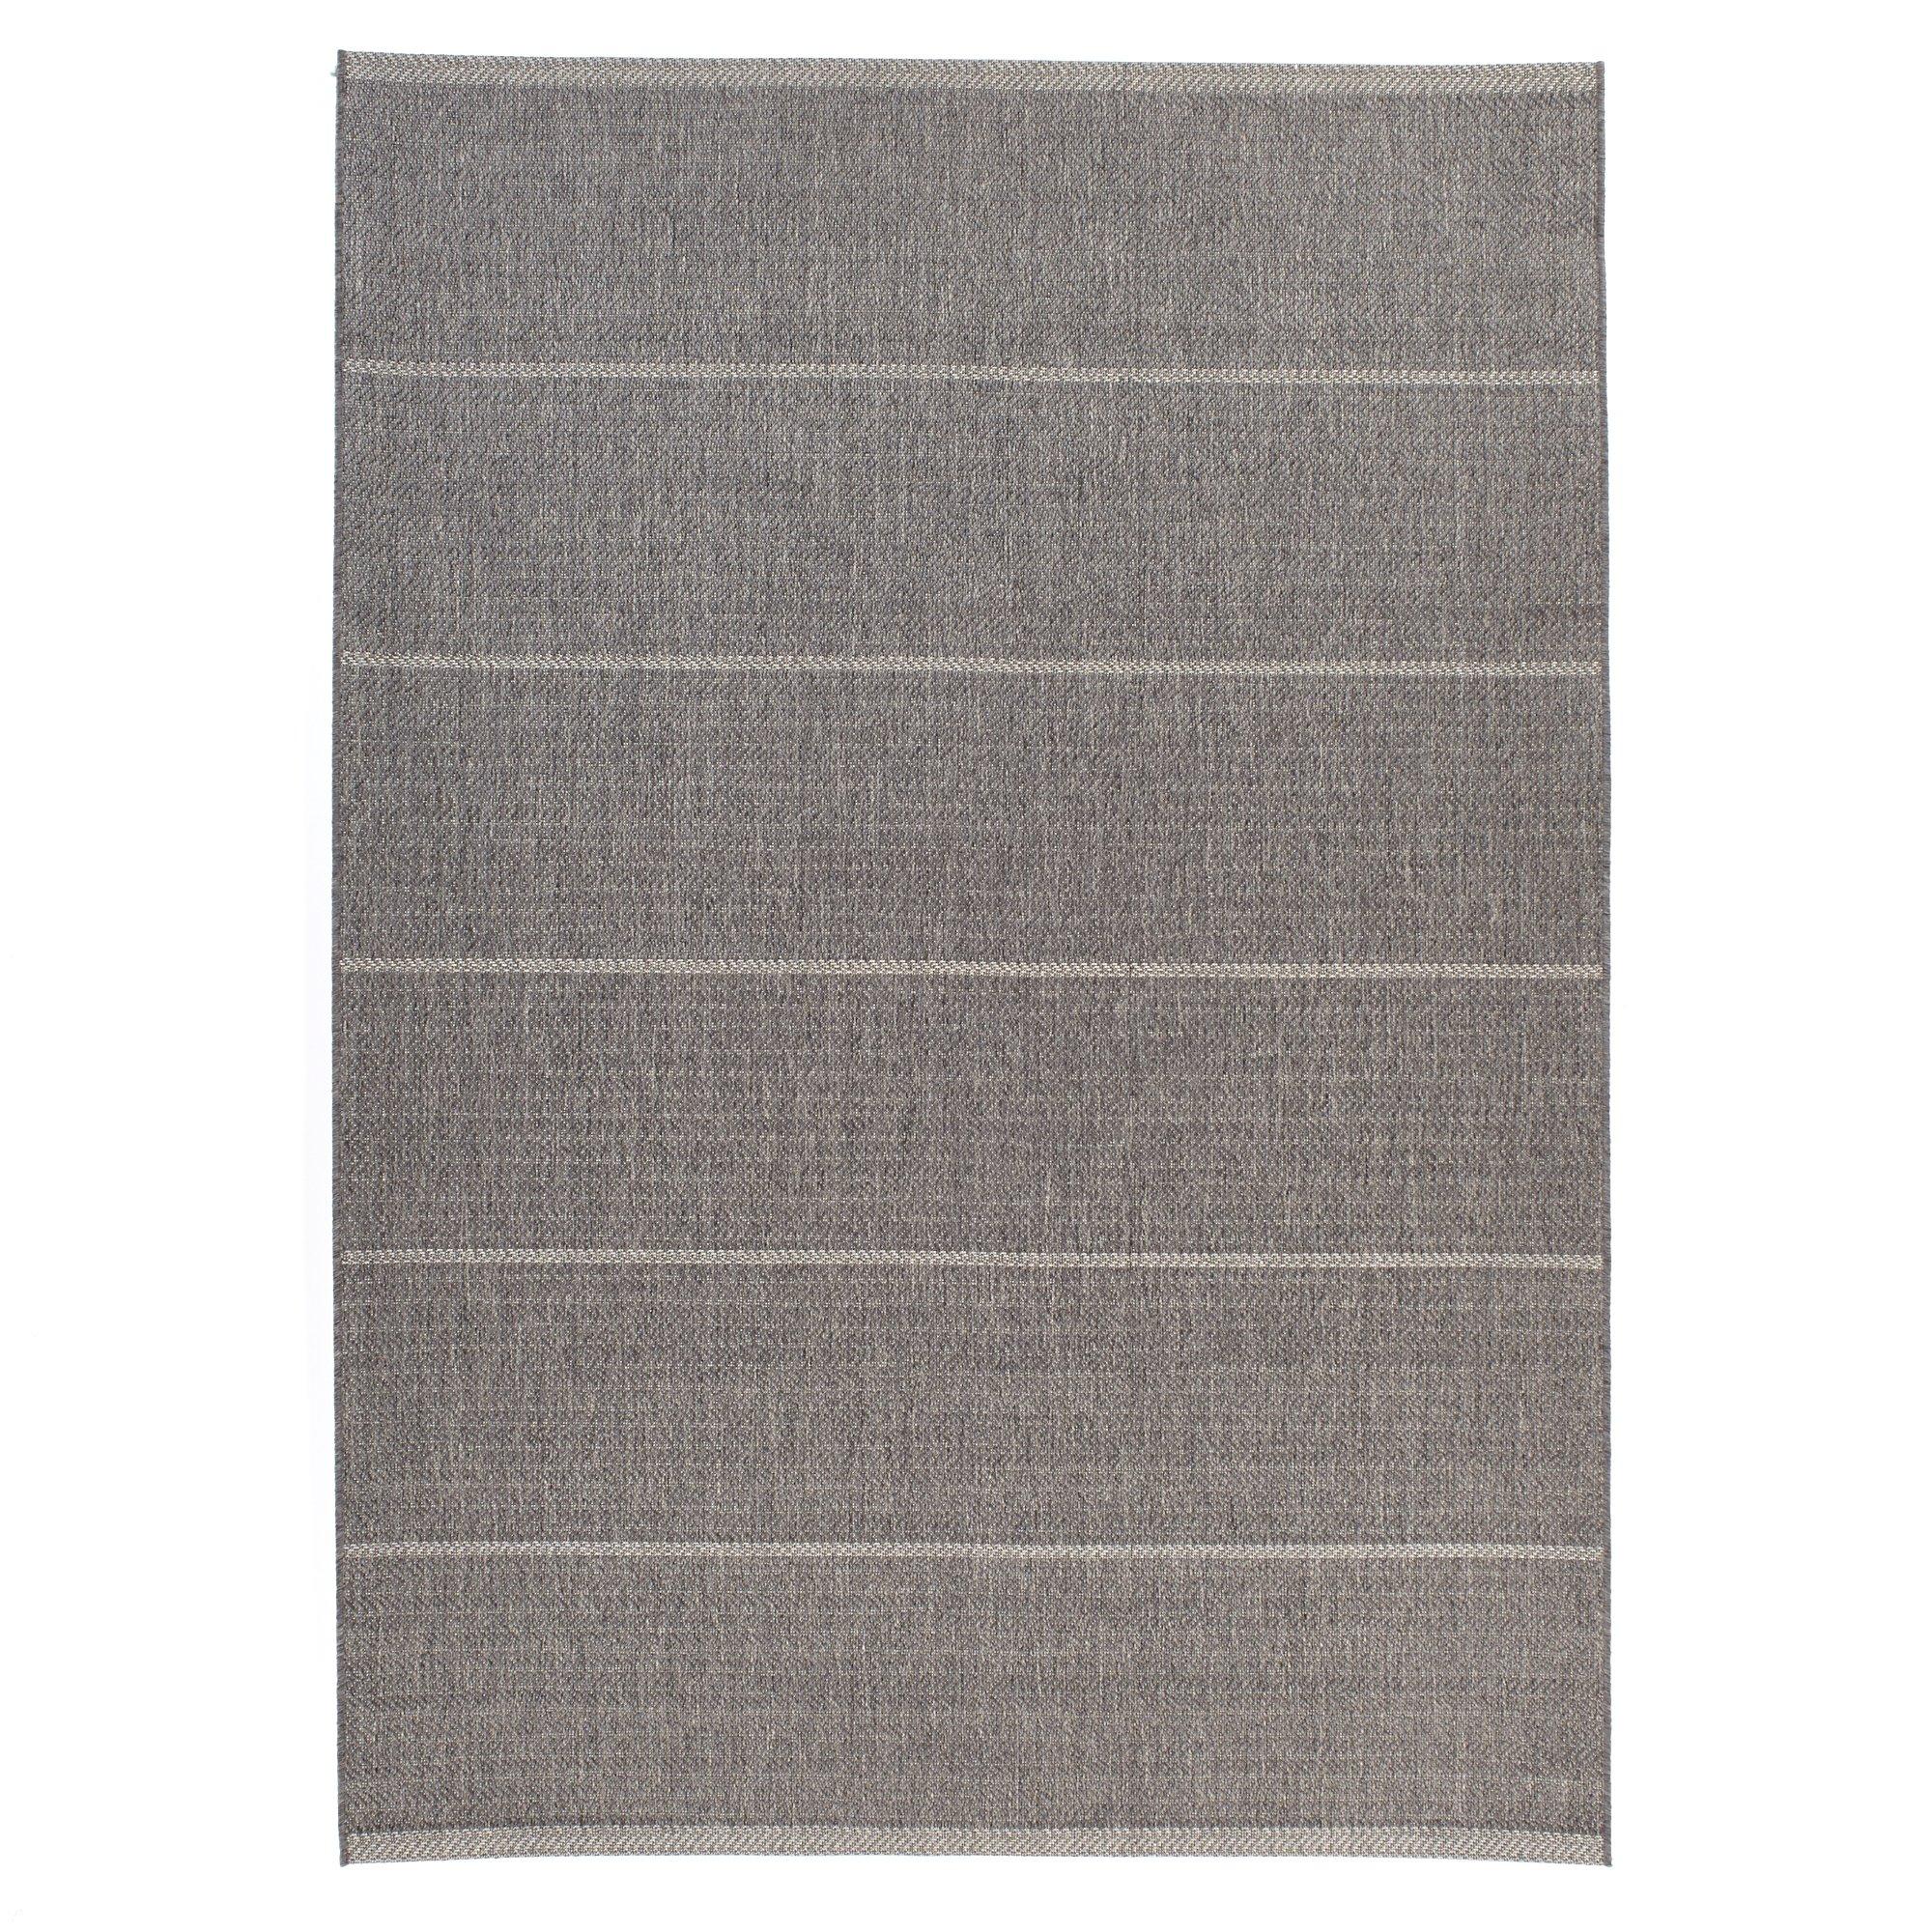 Carpet Art Deco Bay Club Collection Indoor Outdoor Rug, 5'3'' x7'5, Gray